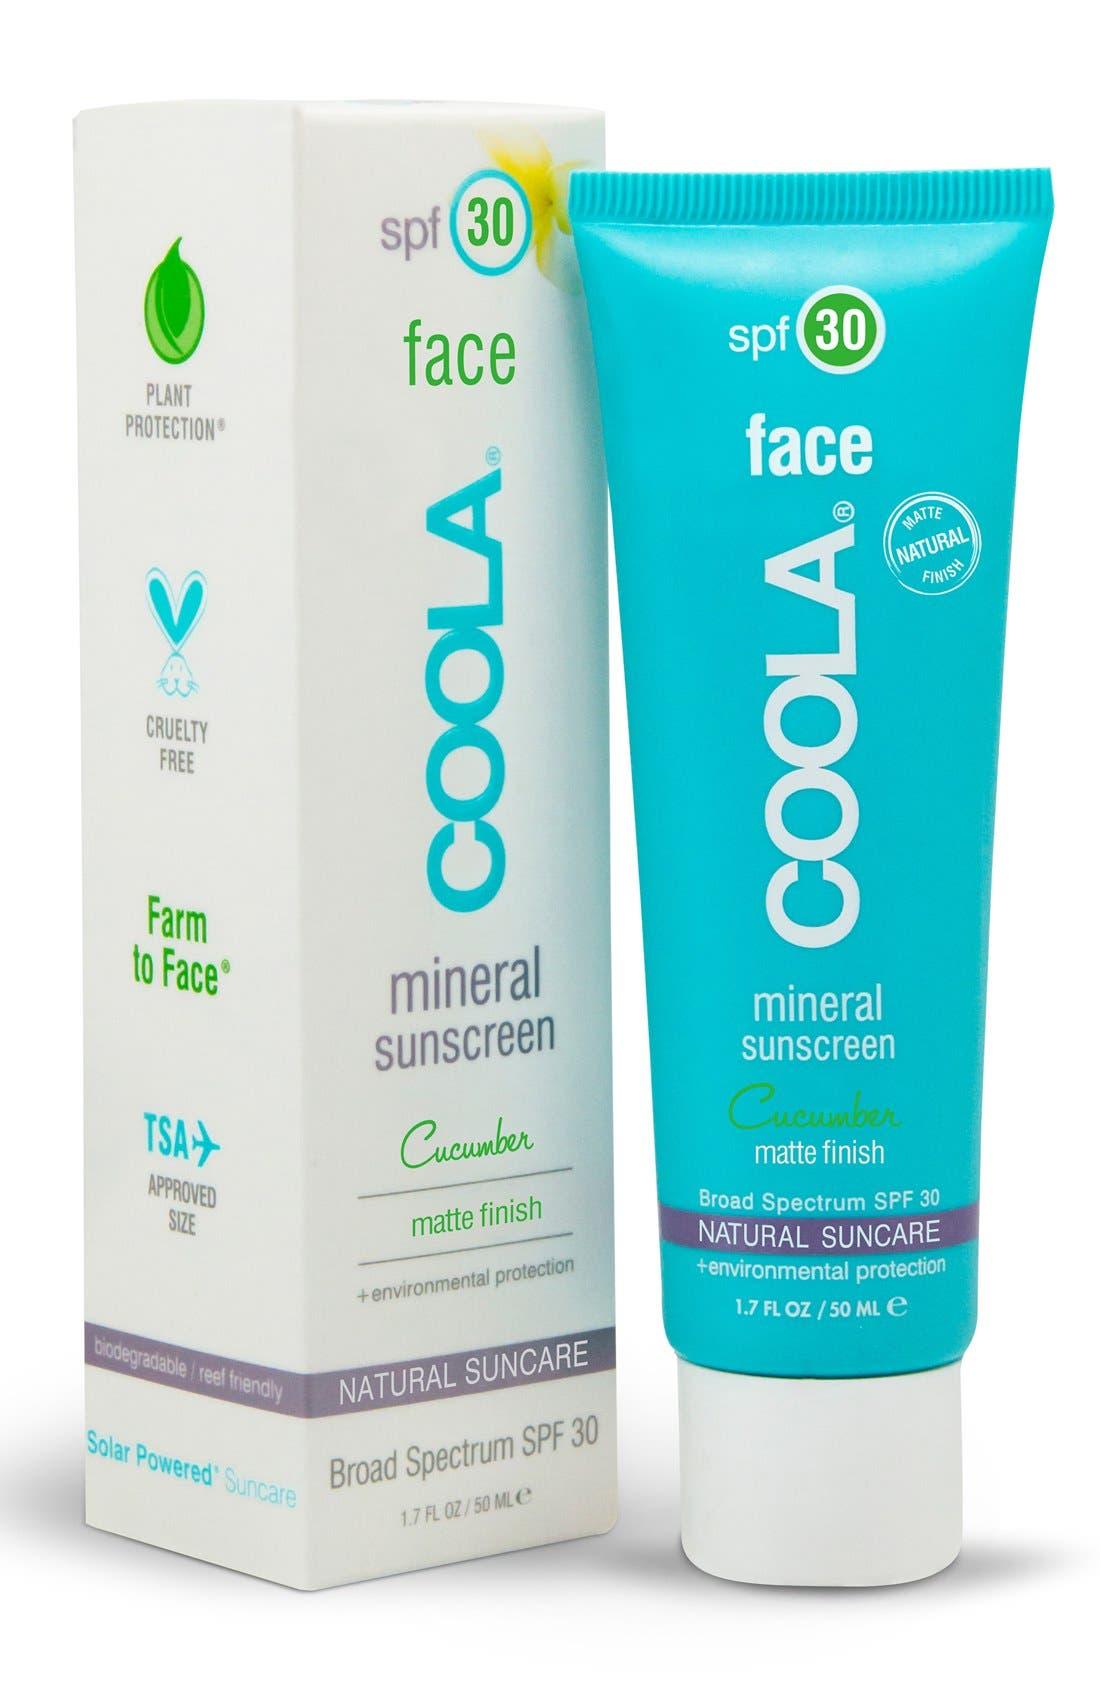 COOLA® Suncare Cucumber Face Mineral Sunscreen SPF 30